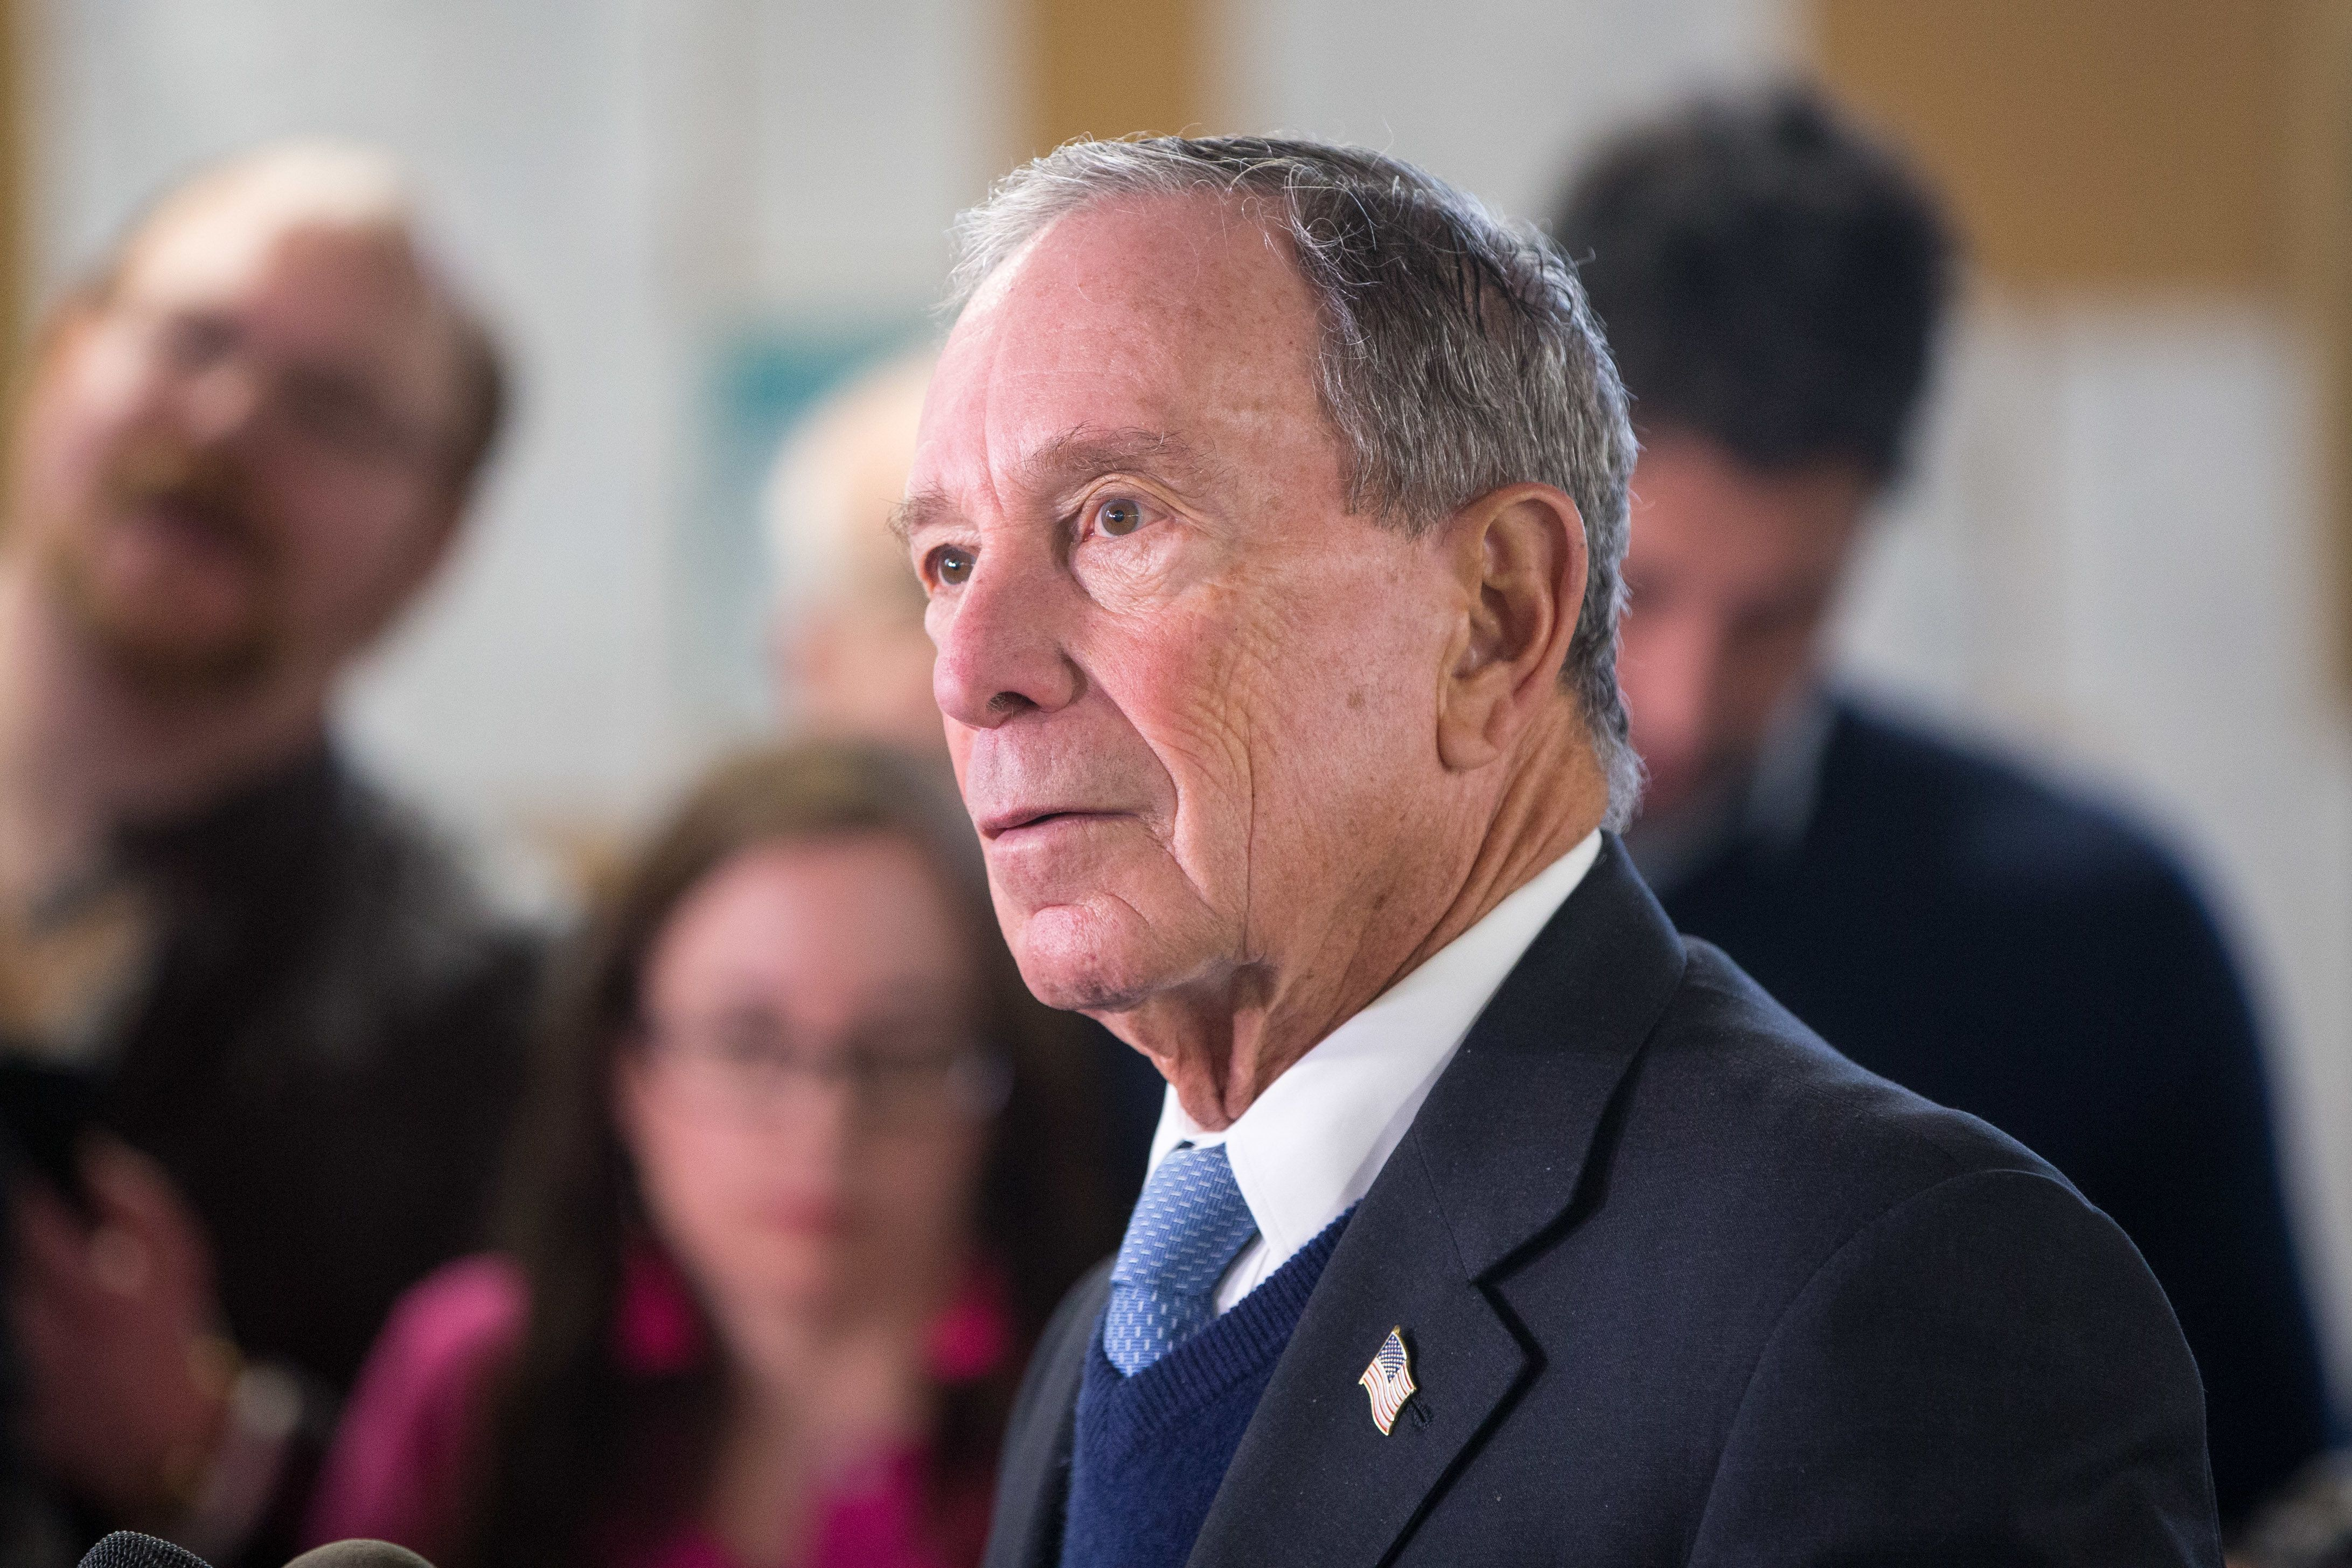 Michael Bloomberg Says He Won't Go On Joe Biden's White Male 'Apology